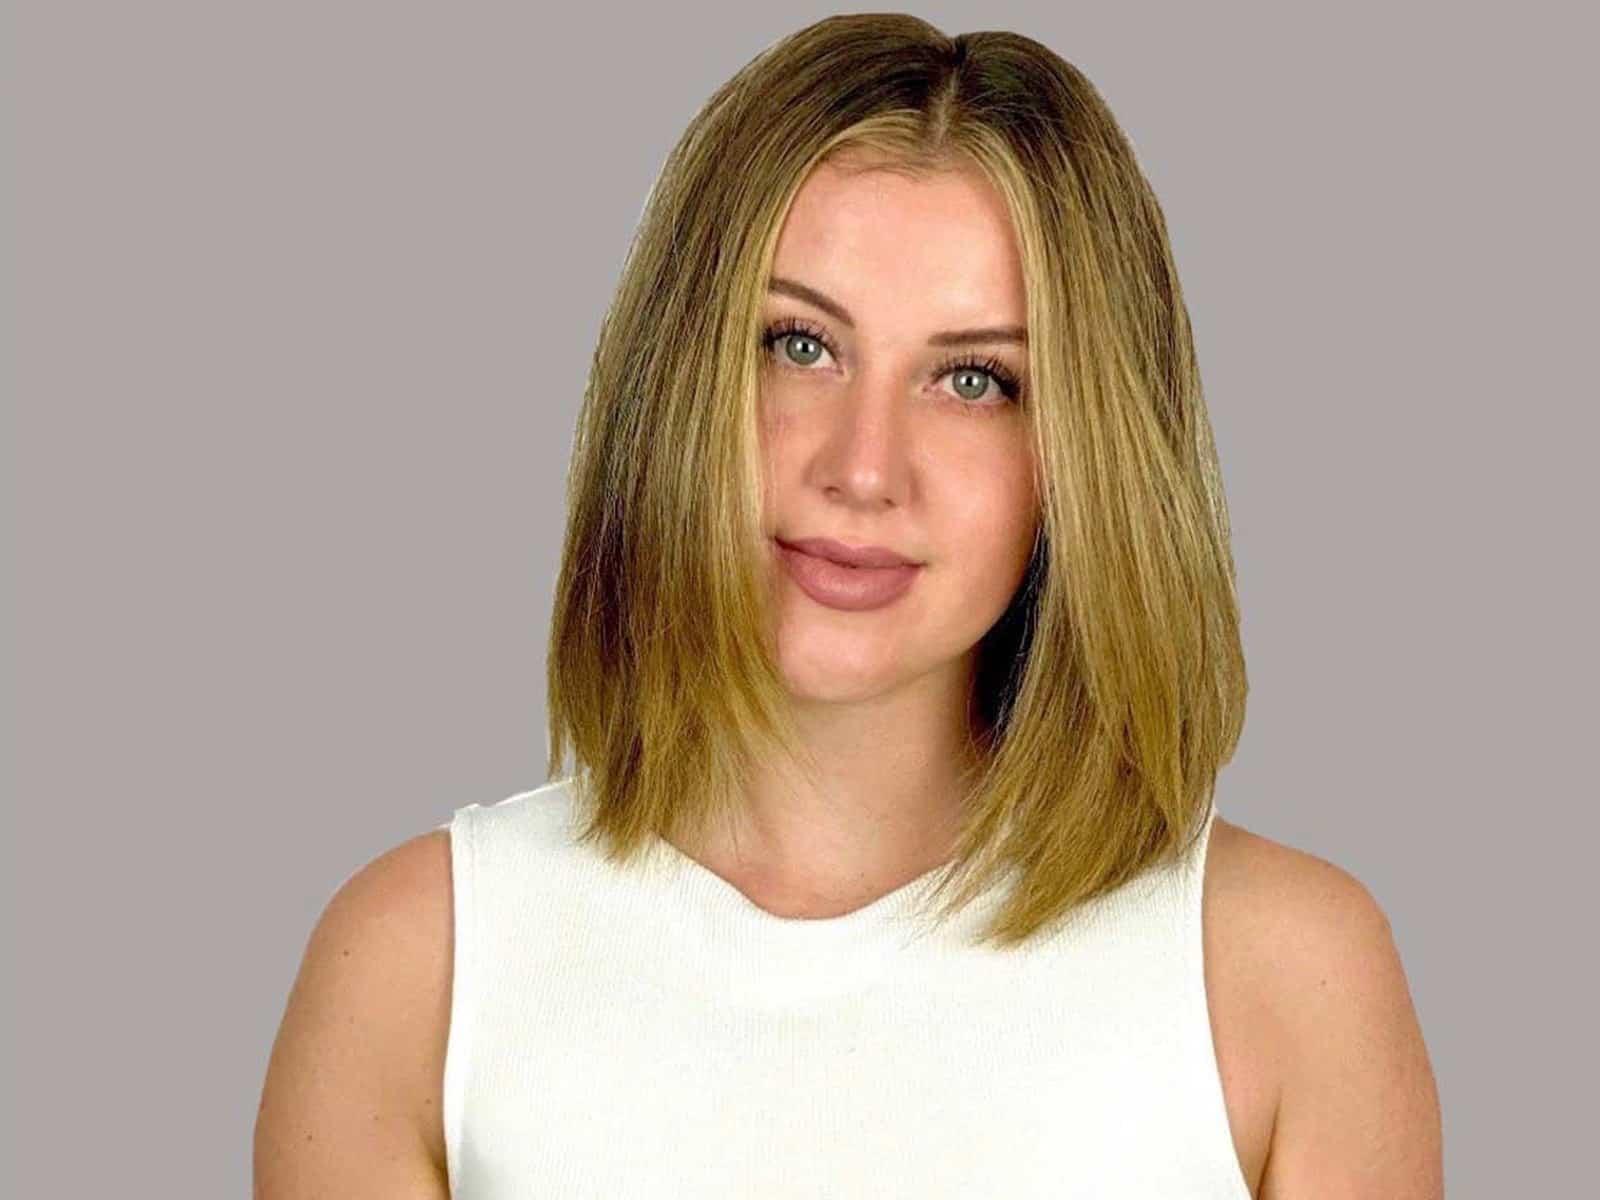 Emma Vollrath - Founder of em:body